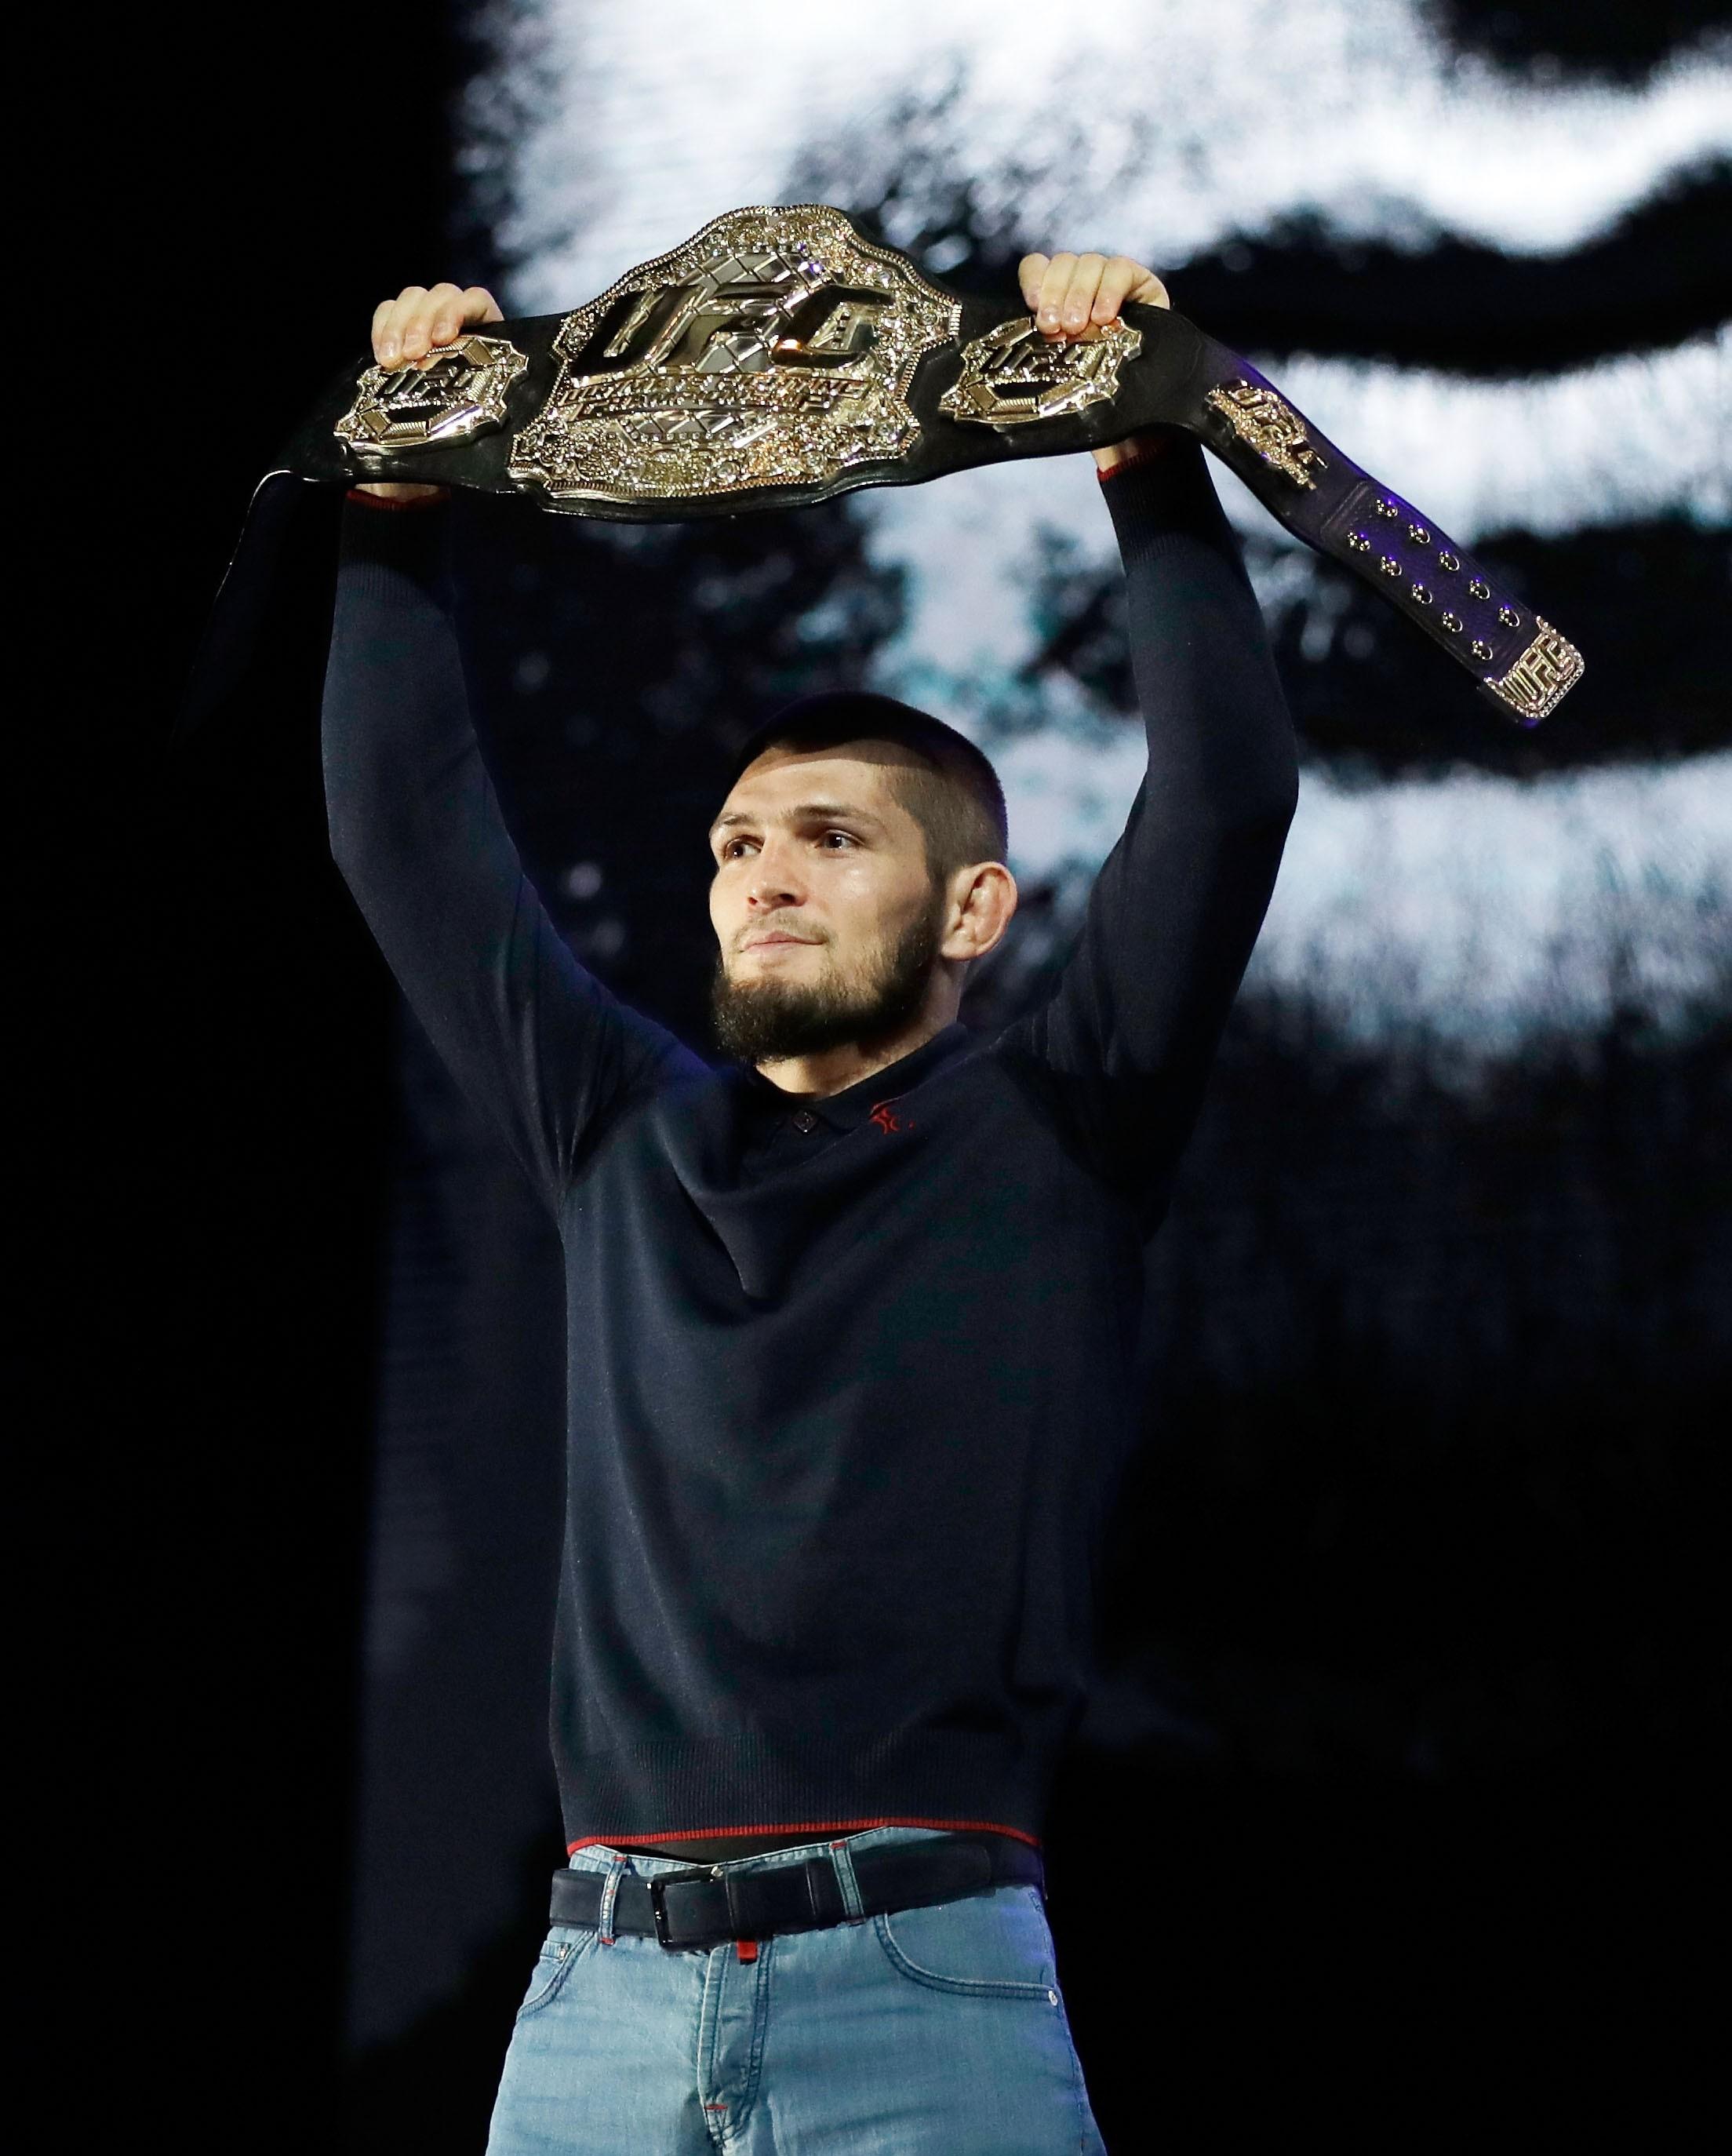 Khabib Nurmagomedov é um wrestler puro - e campeão invicto (Foto: Getty Images/ Isaac Brekken)